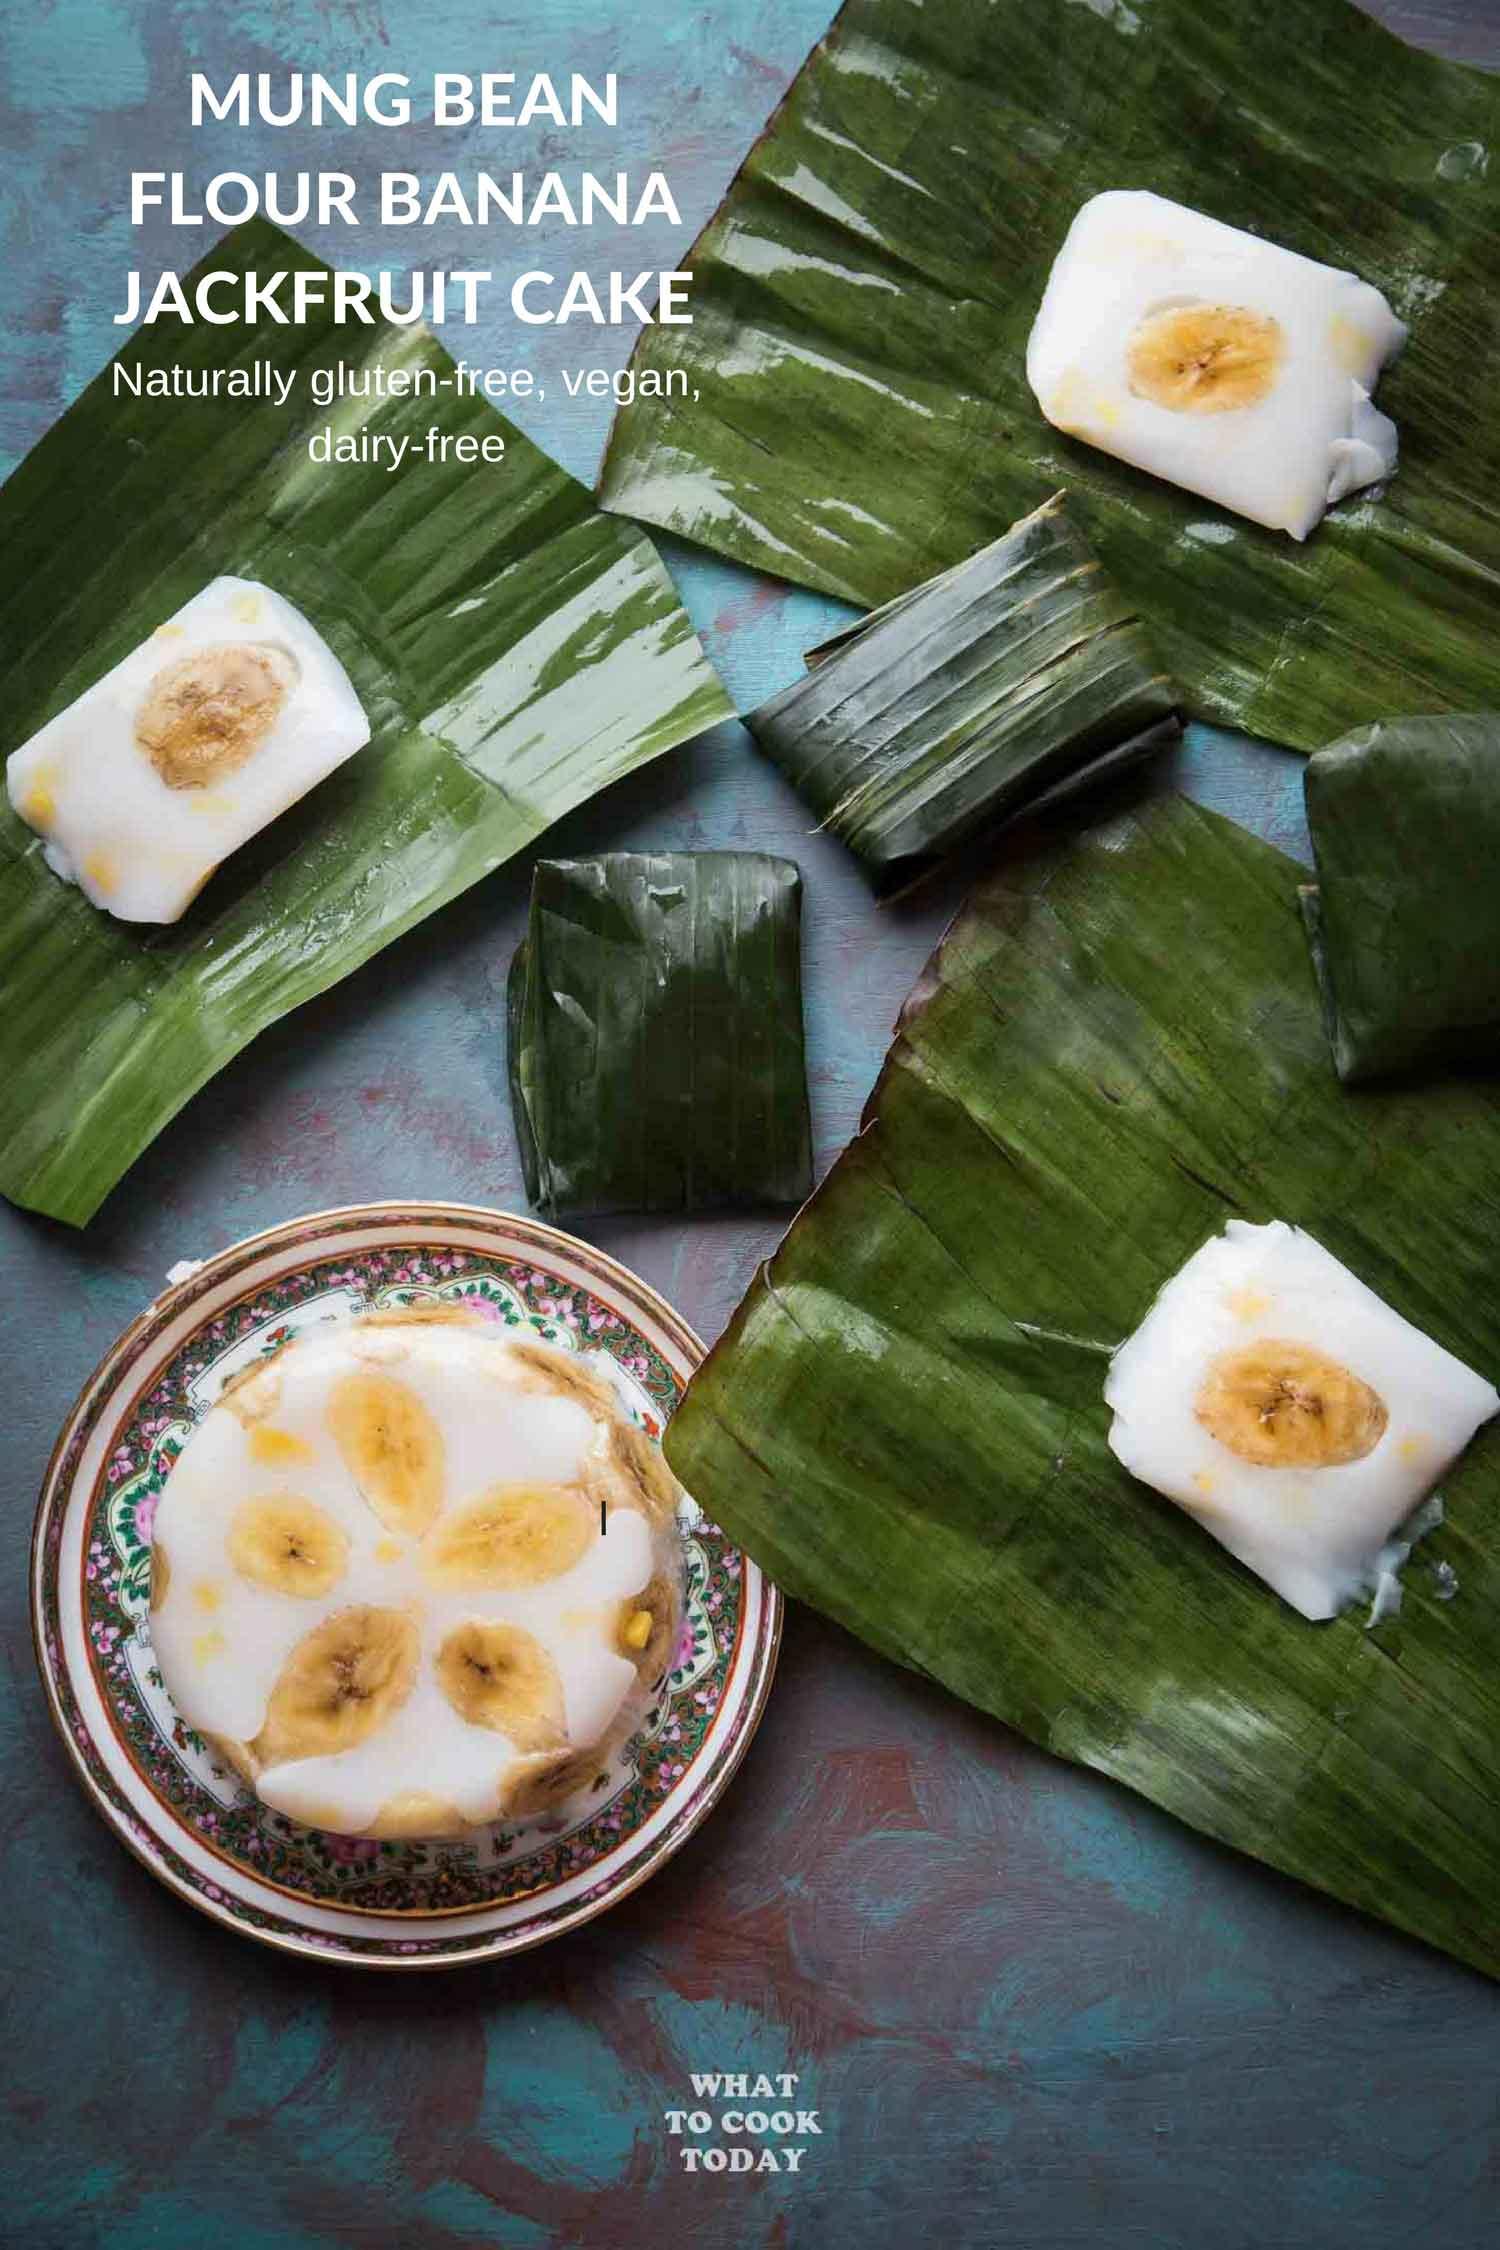 Hun Kwe Pisang Nangka (Mung Bean Flour Banana Jackfruit Cake) - Learn how to make soft and bouncy mung bean flour cake studded with sliced bananas and sweet jackfruit pieces wrapped in banana leaves (or not) #jackfruit #banana #glutenfree #mungbean #vegan #indonesianfood #dessert